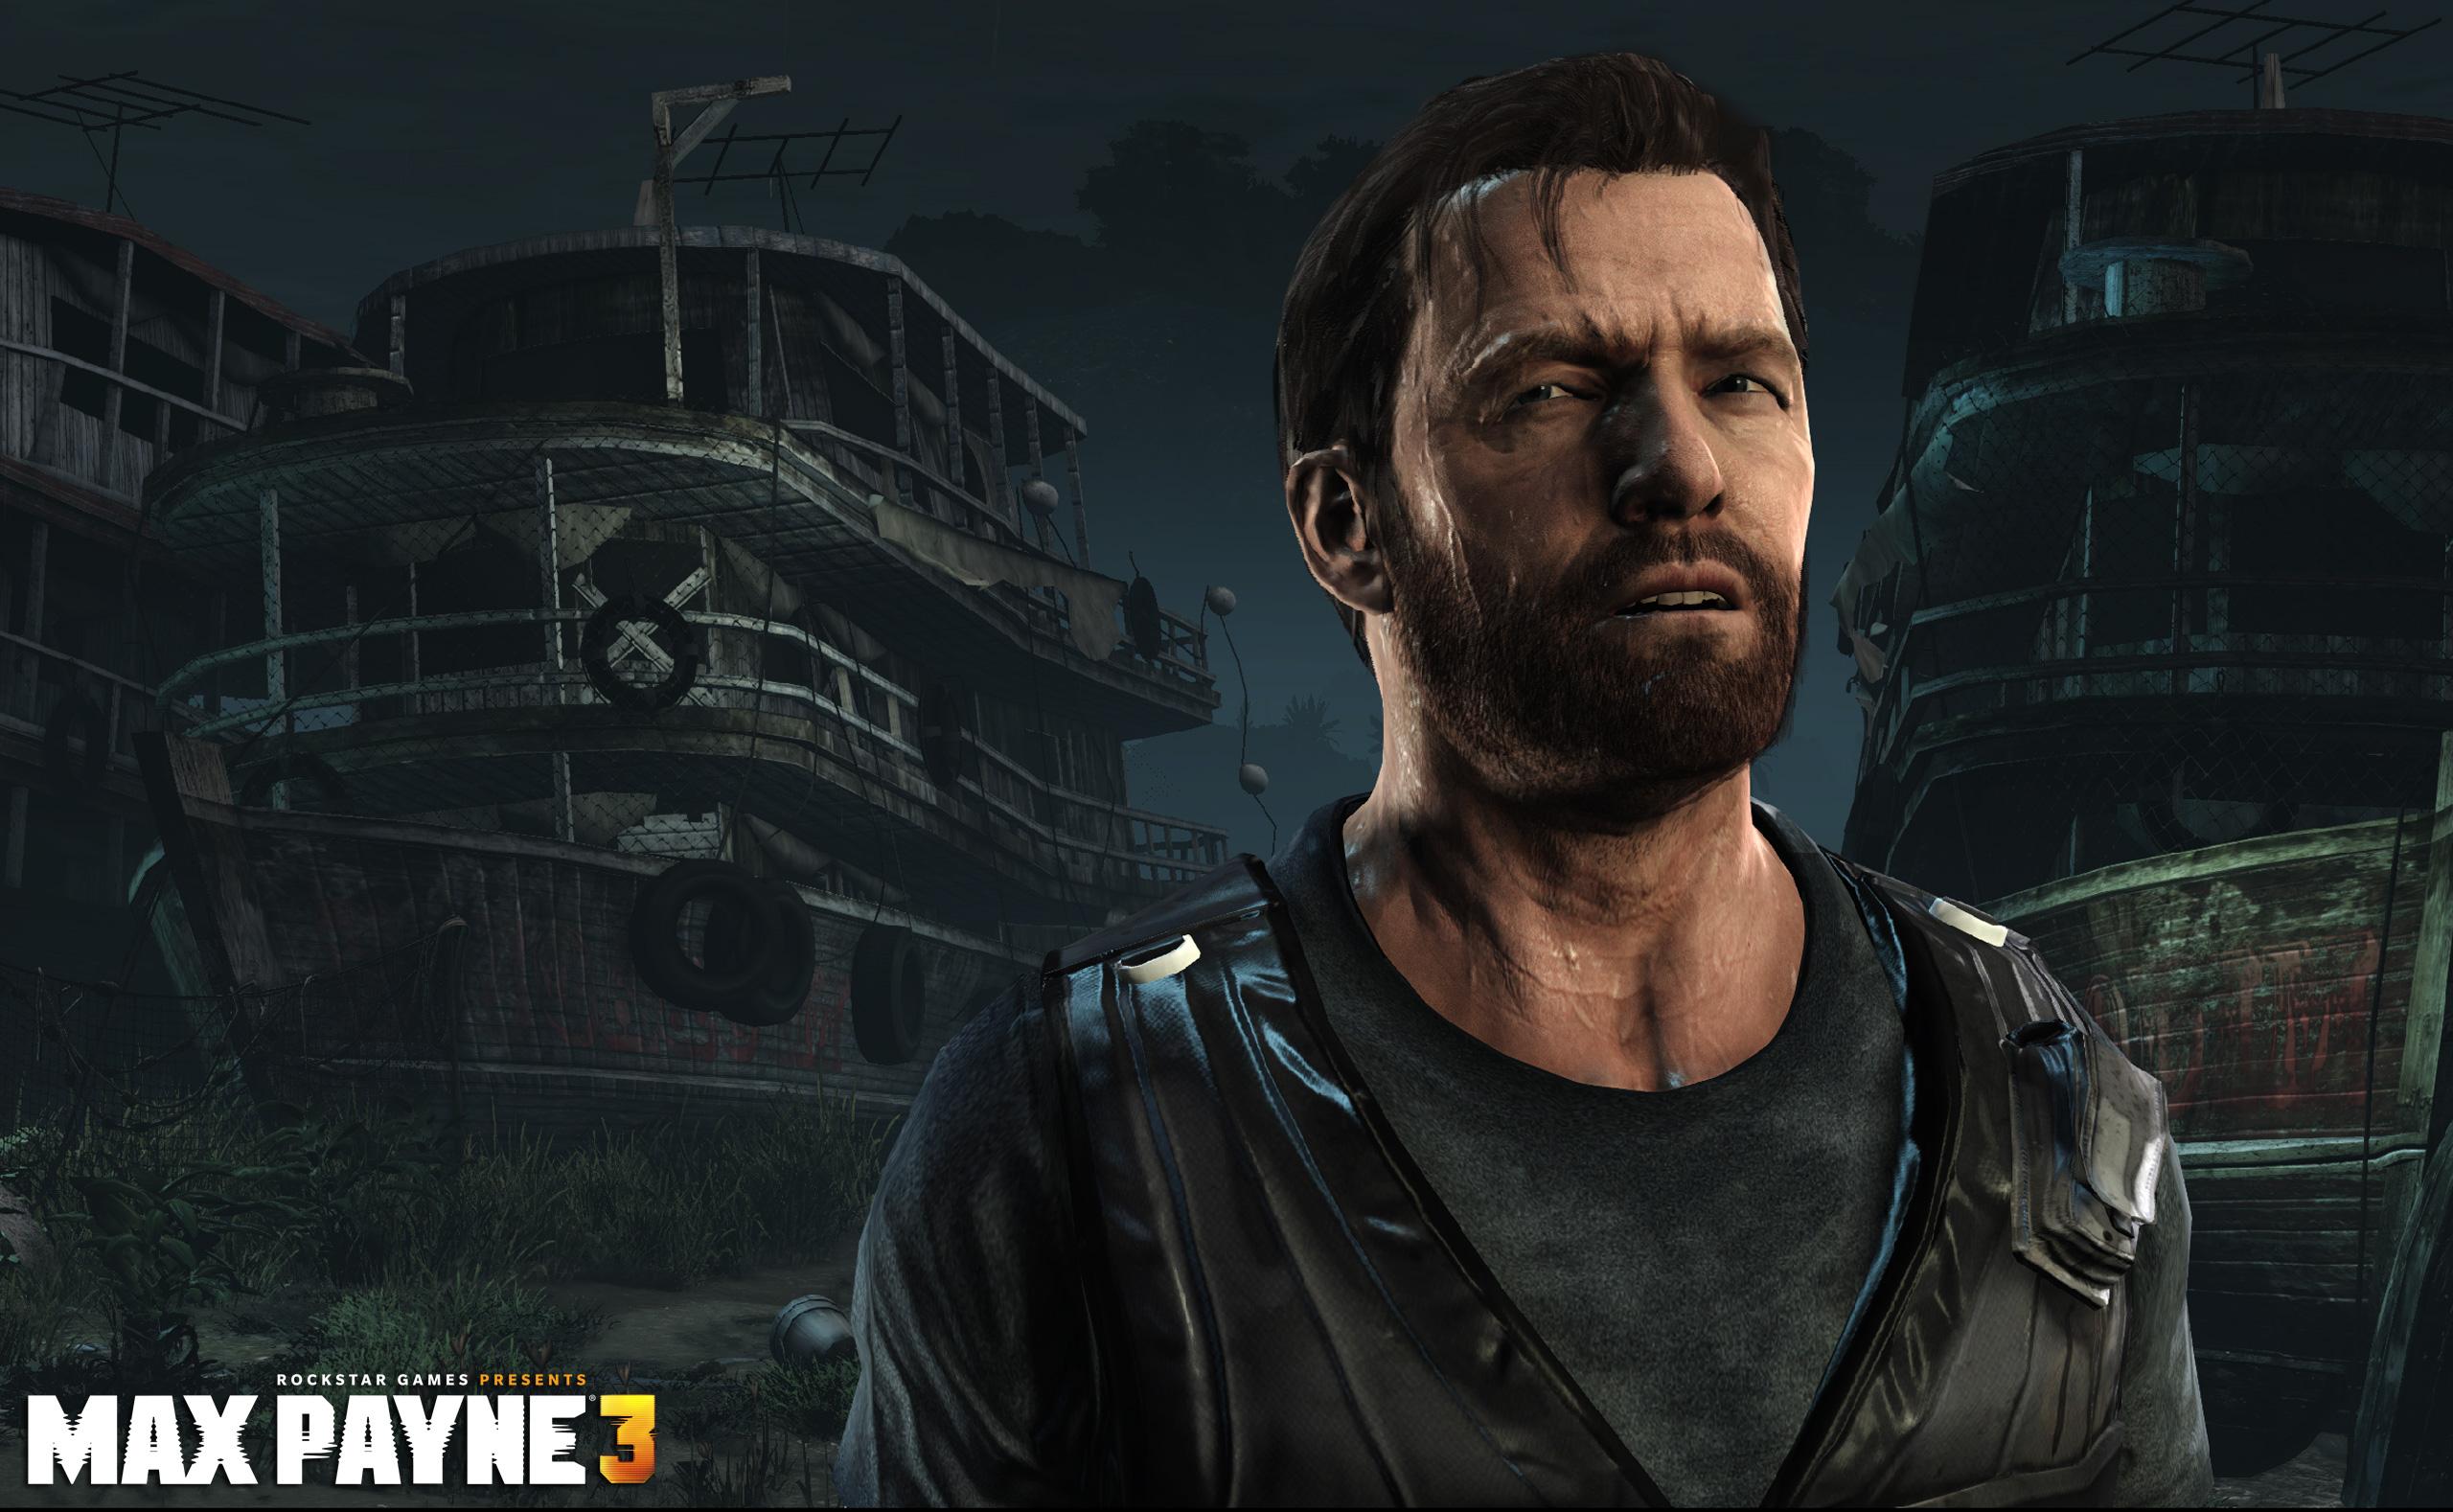 Max Payne 2 Film